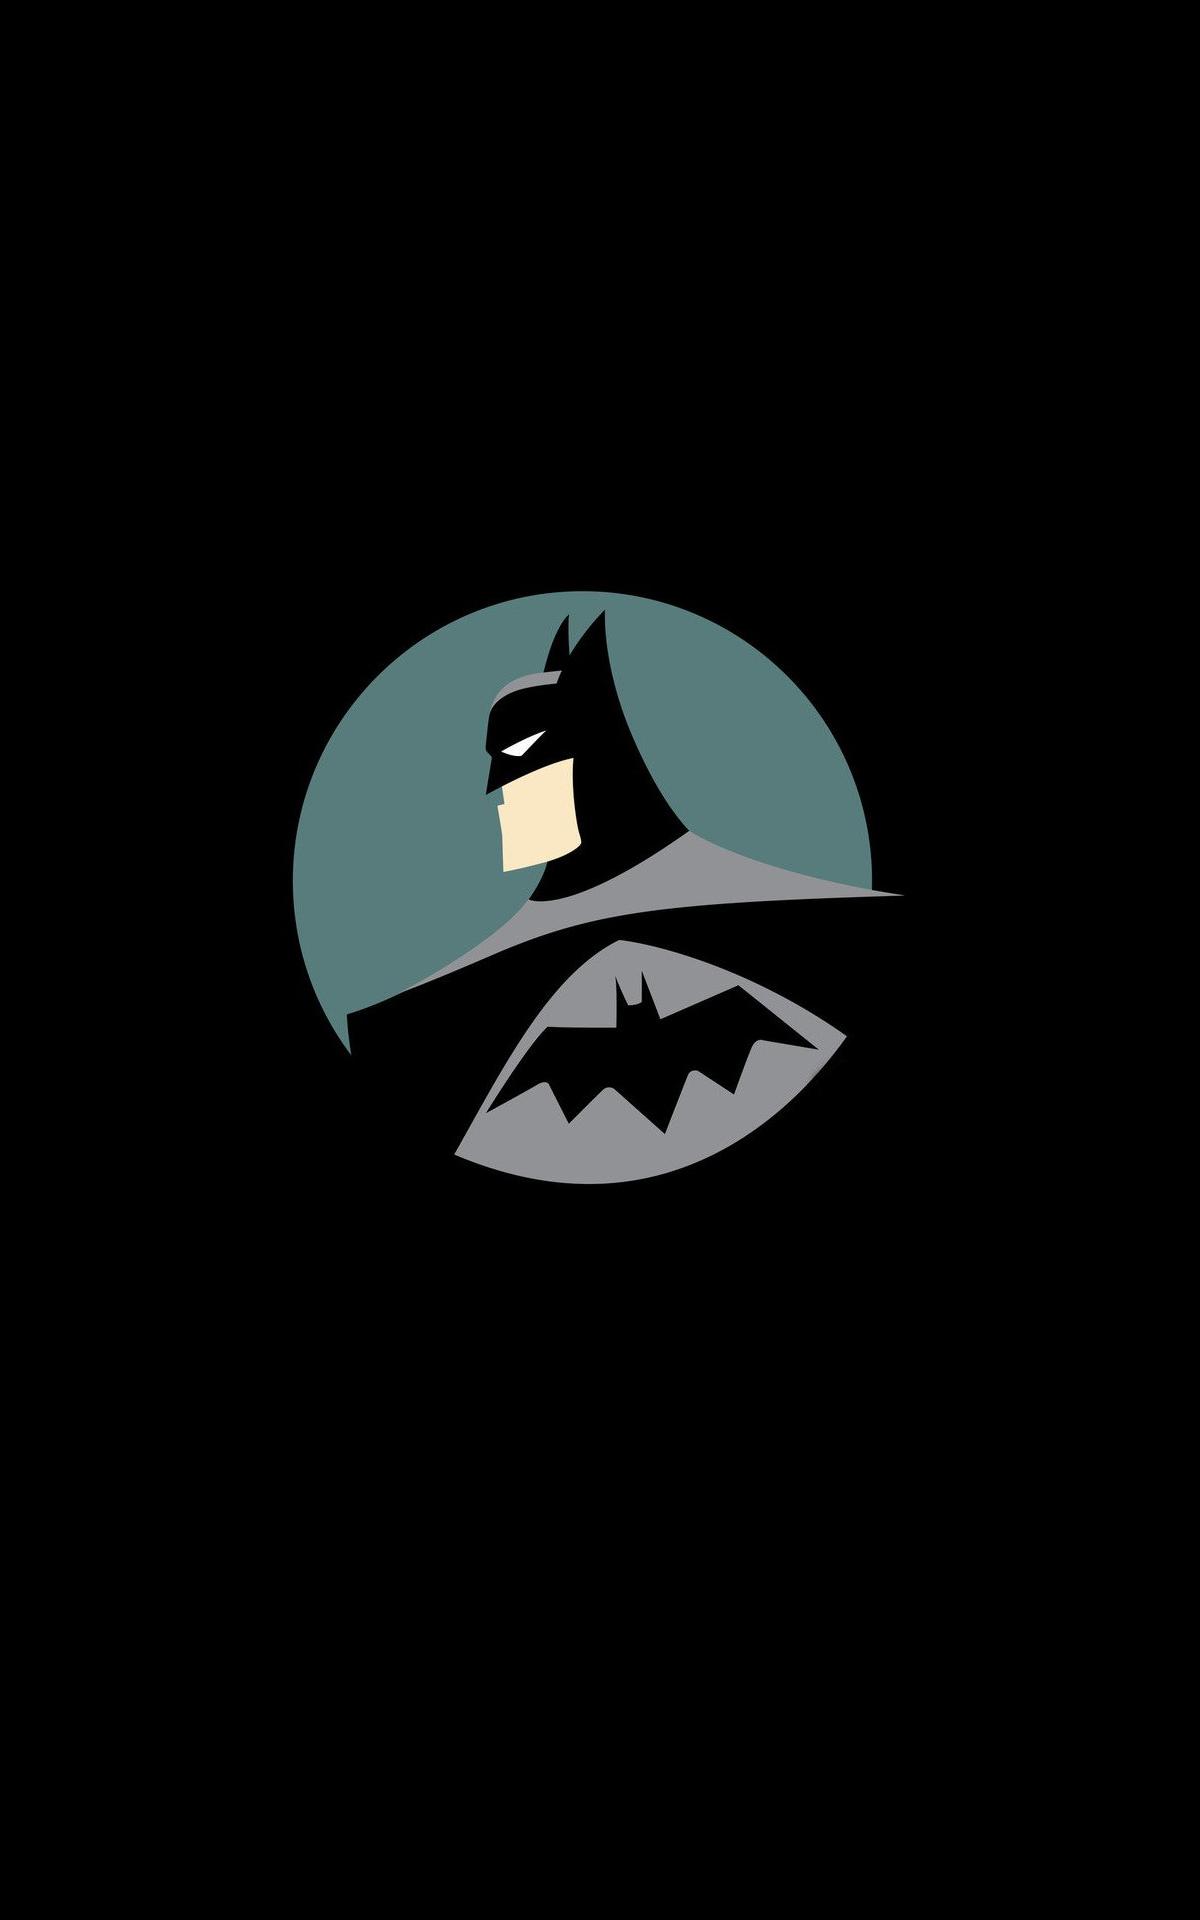 batman cartoon phonecase cover case for apple ipod 4 ipod 5 ipod 6